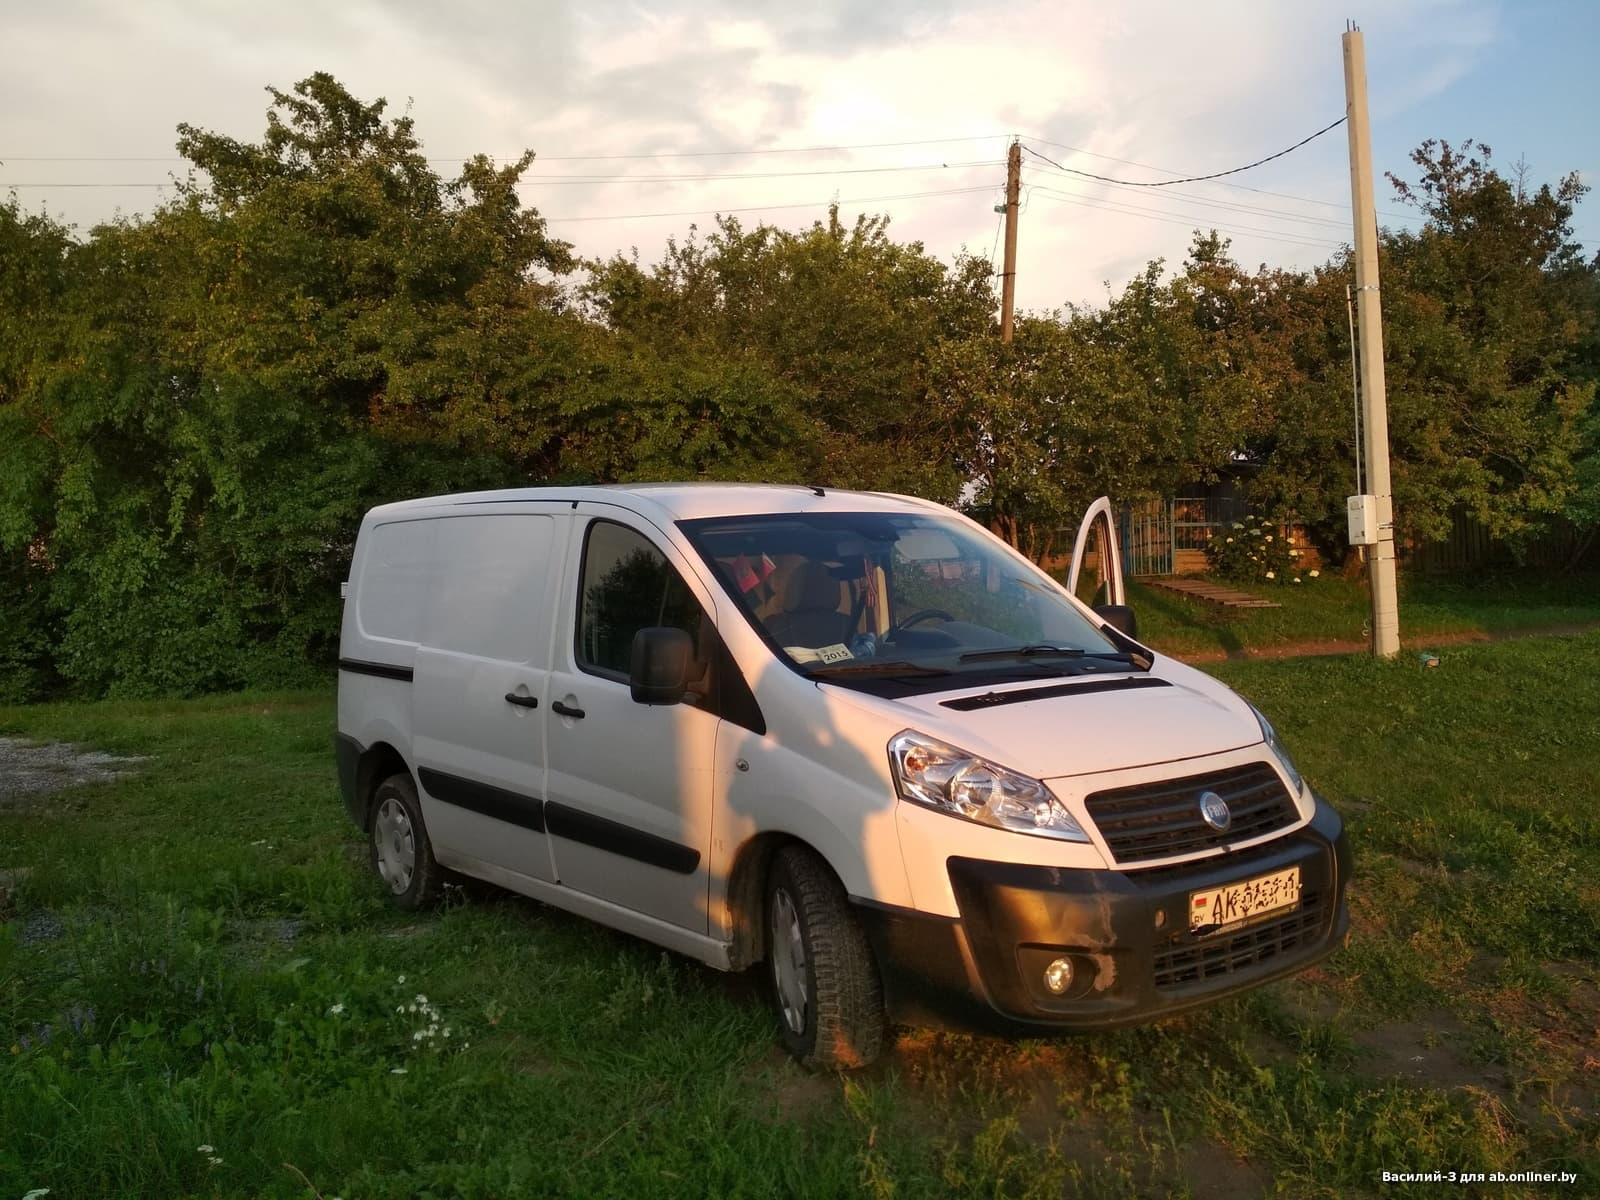 Fiat Scudo 90 Multijet